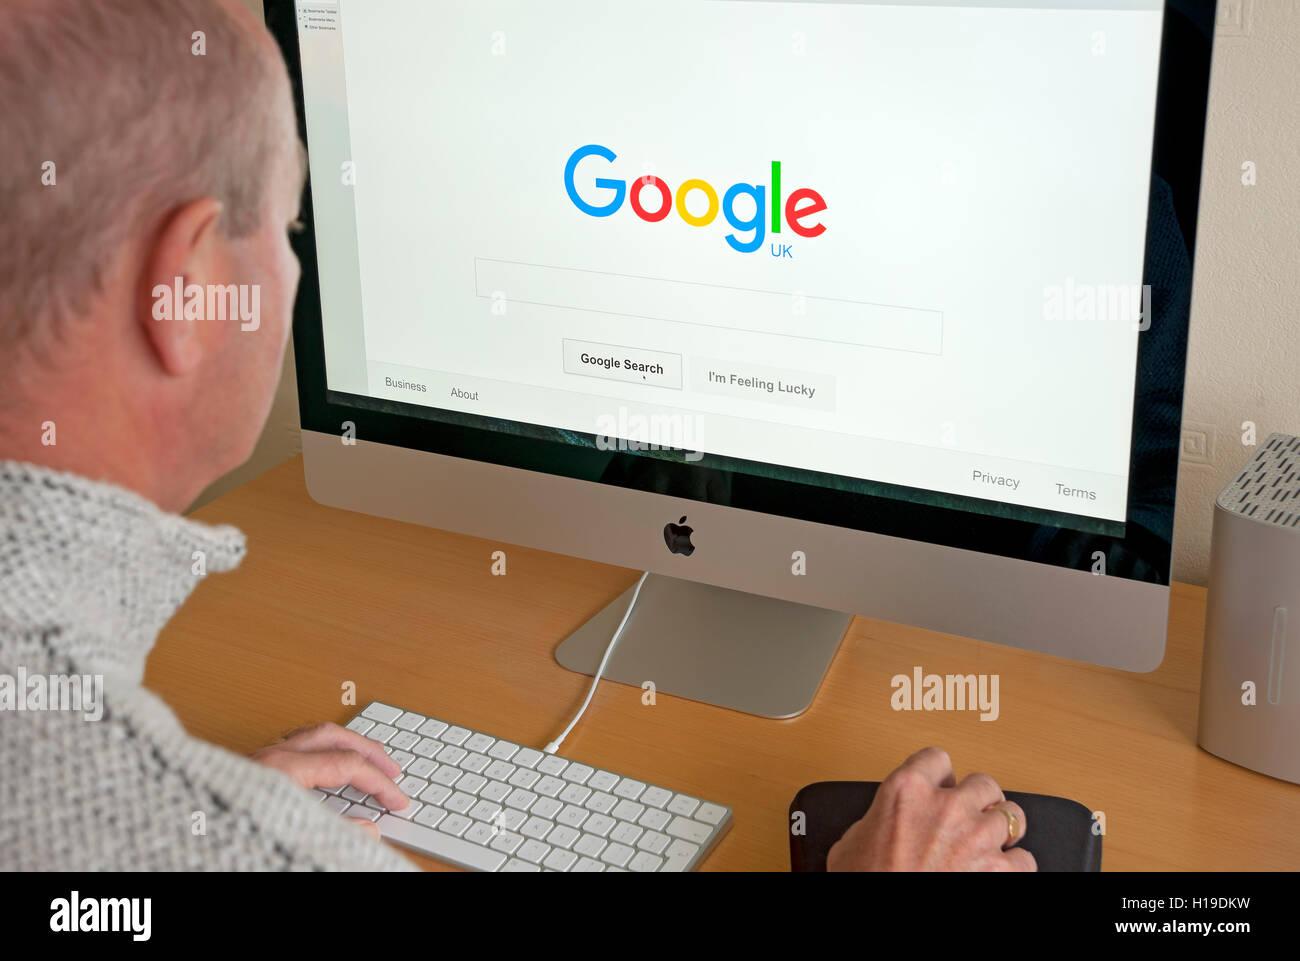 Man looking at Google UK homepage on computer screen UK United Kingdom GB Great Britain - Stock Image